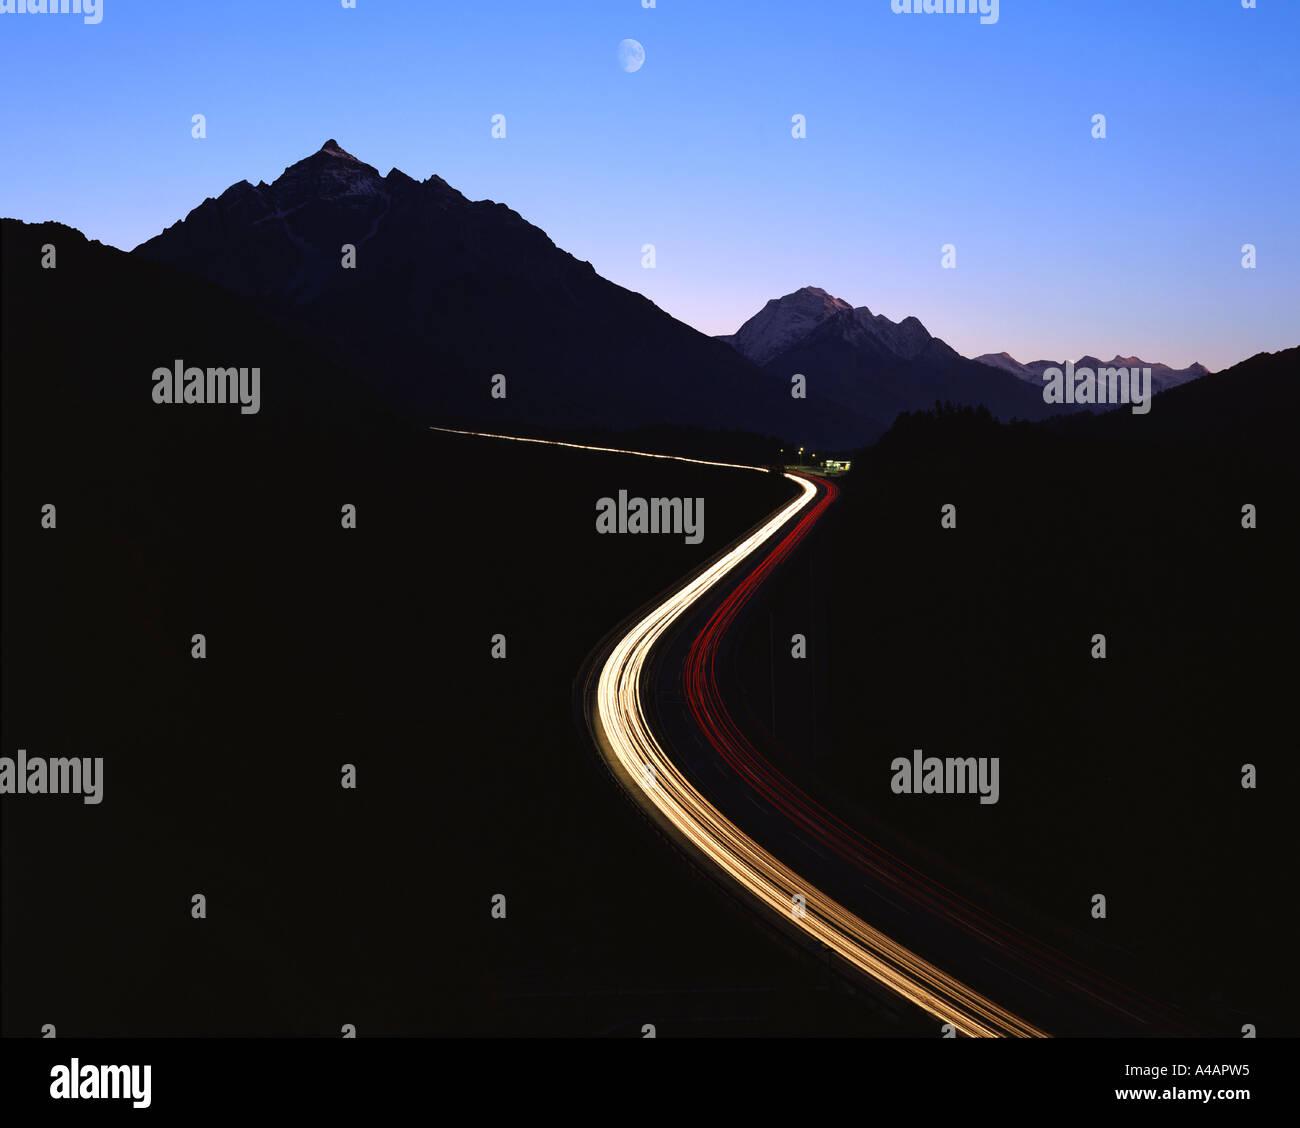 AT - TYROL: Brenner Autobahn bei Nacht Stockbild